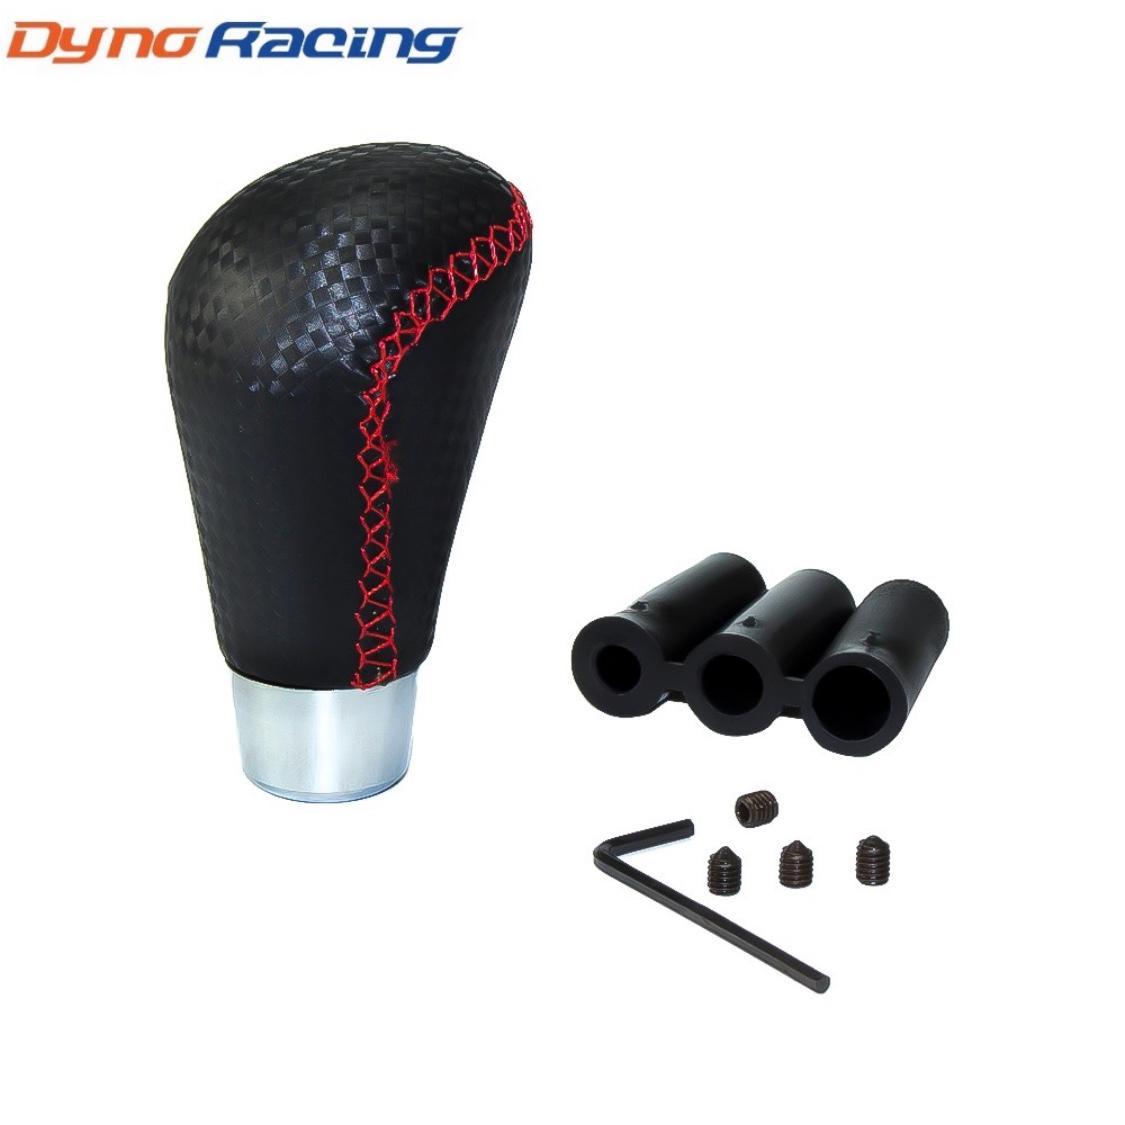 Car High quality JDM Manual Carbon Fiber Type Shifter Shift Knob Cover Stitch Gear Shift Knob TT100881